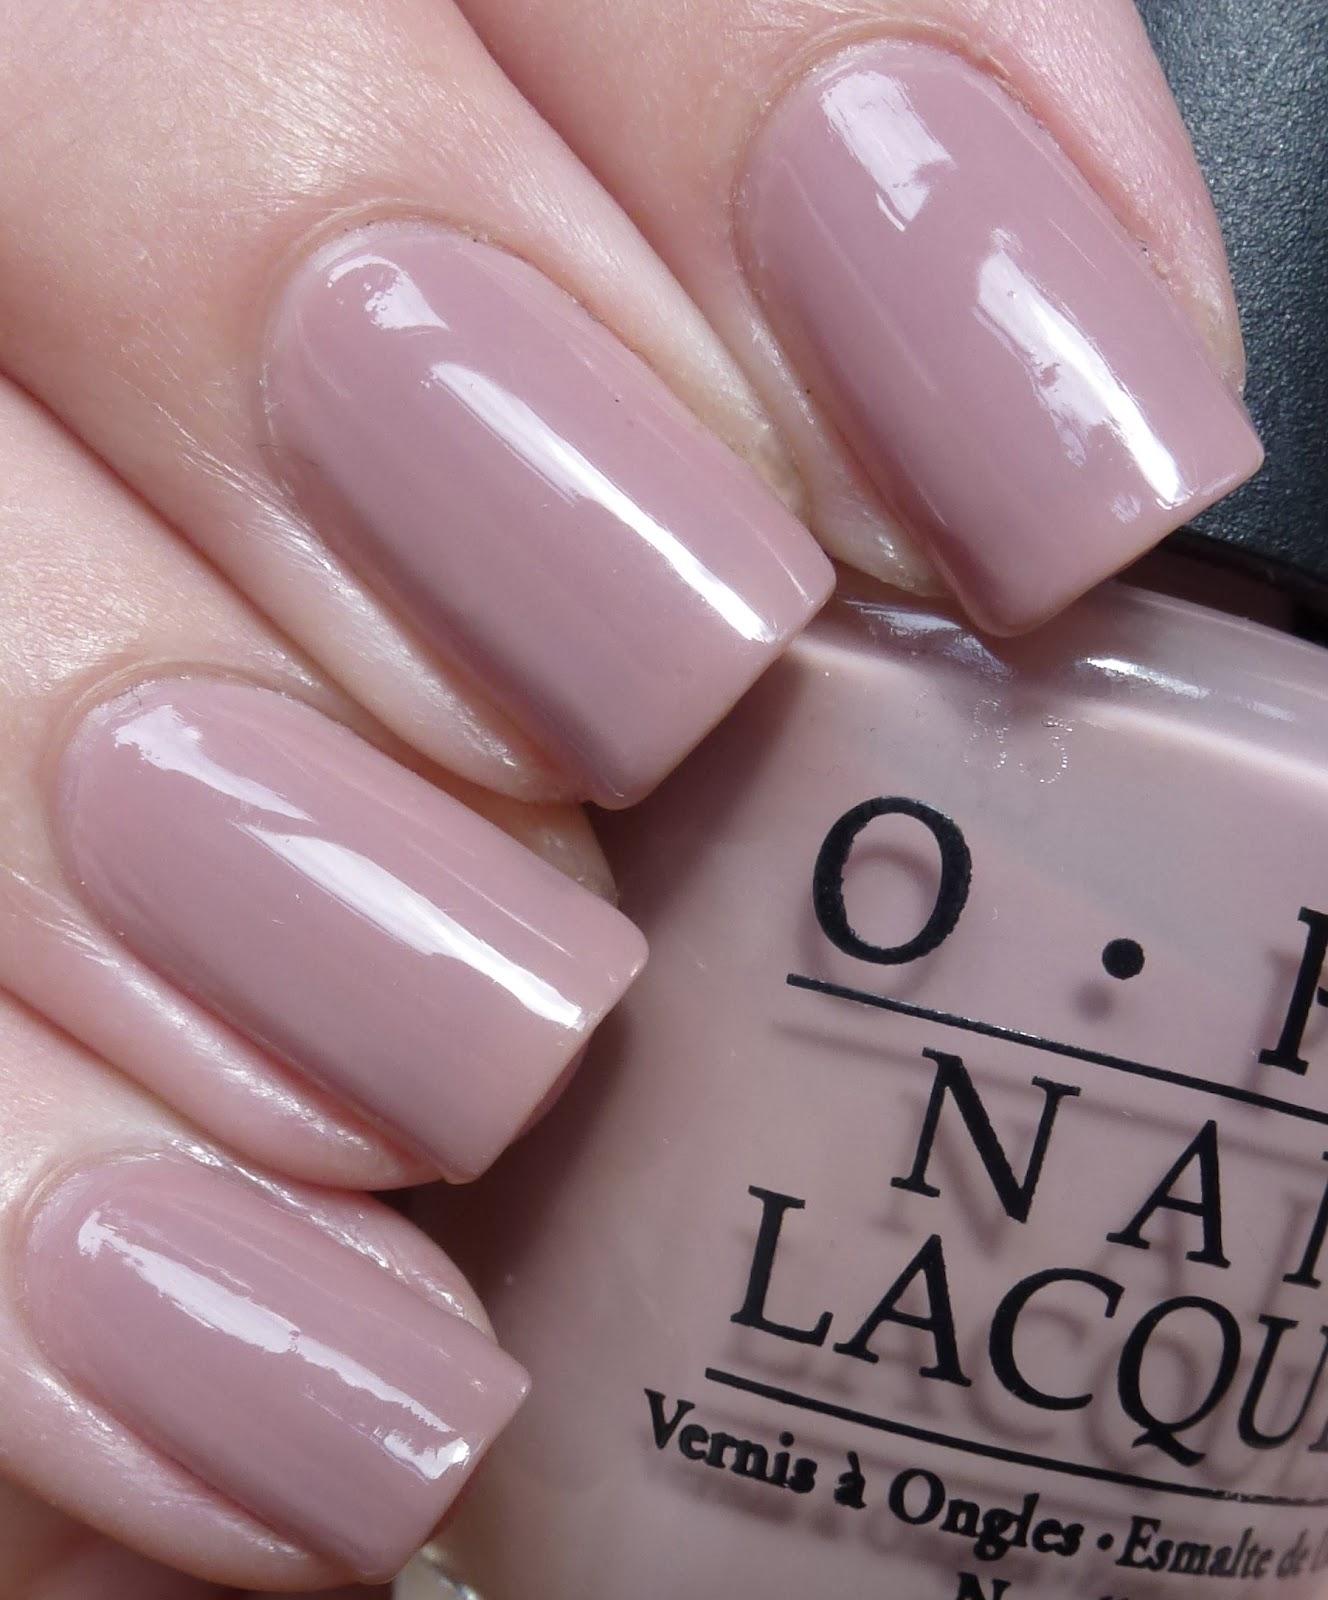 15 Best Nail Polish Colors For Fair Skin Tones Folder